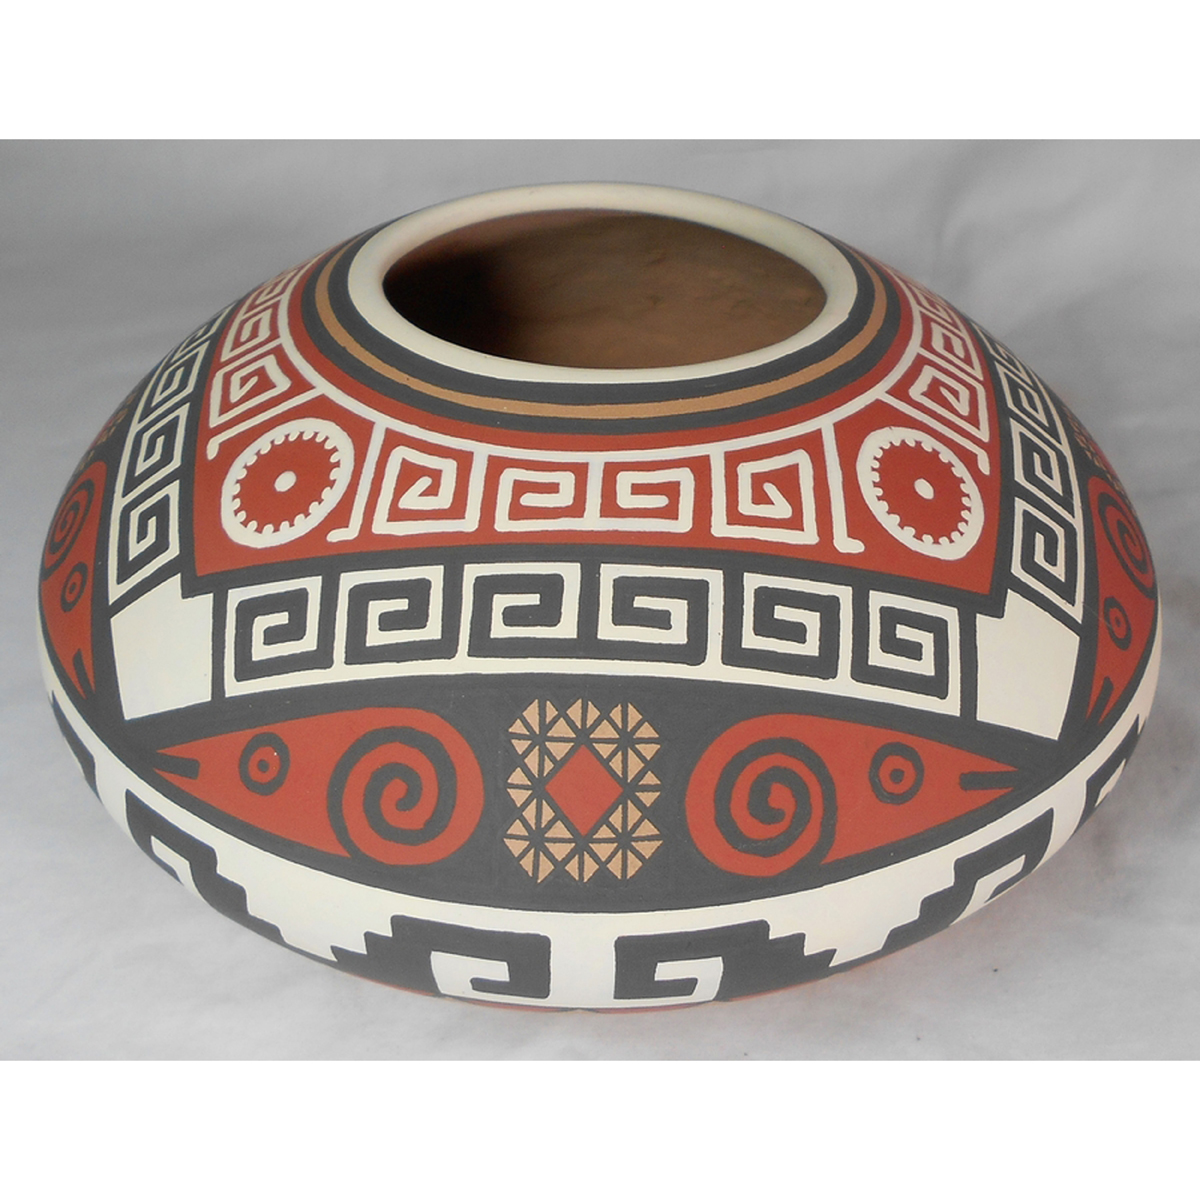 Mata Ortiz Pottery by Enrique Pedregon